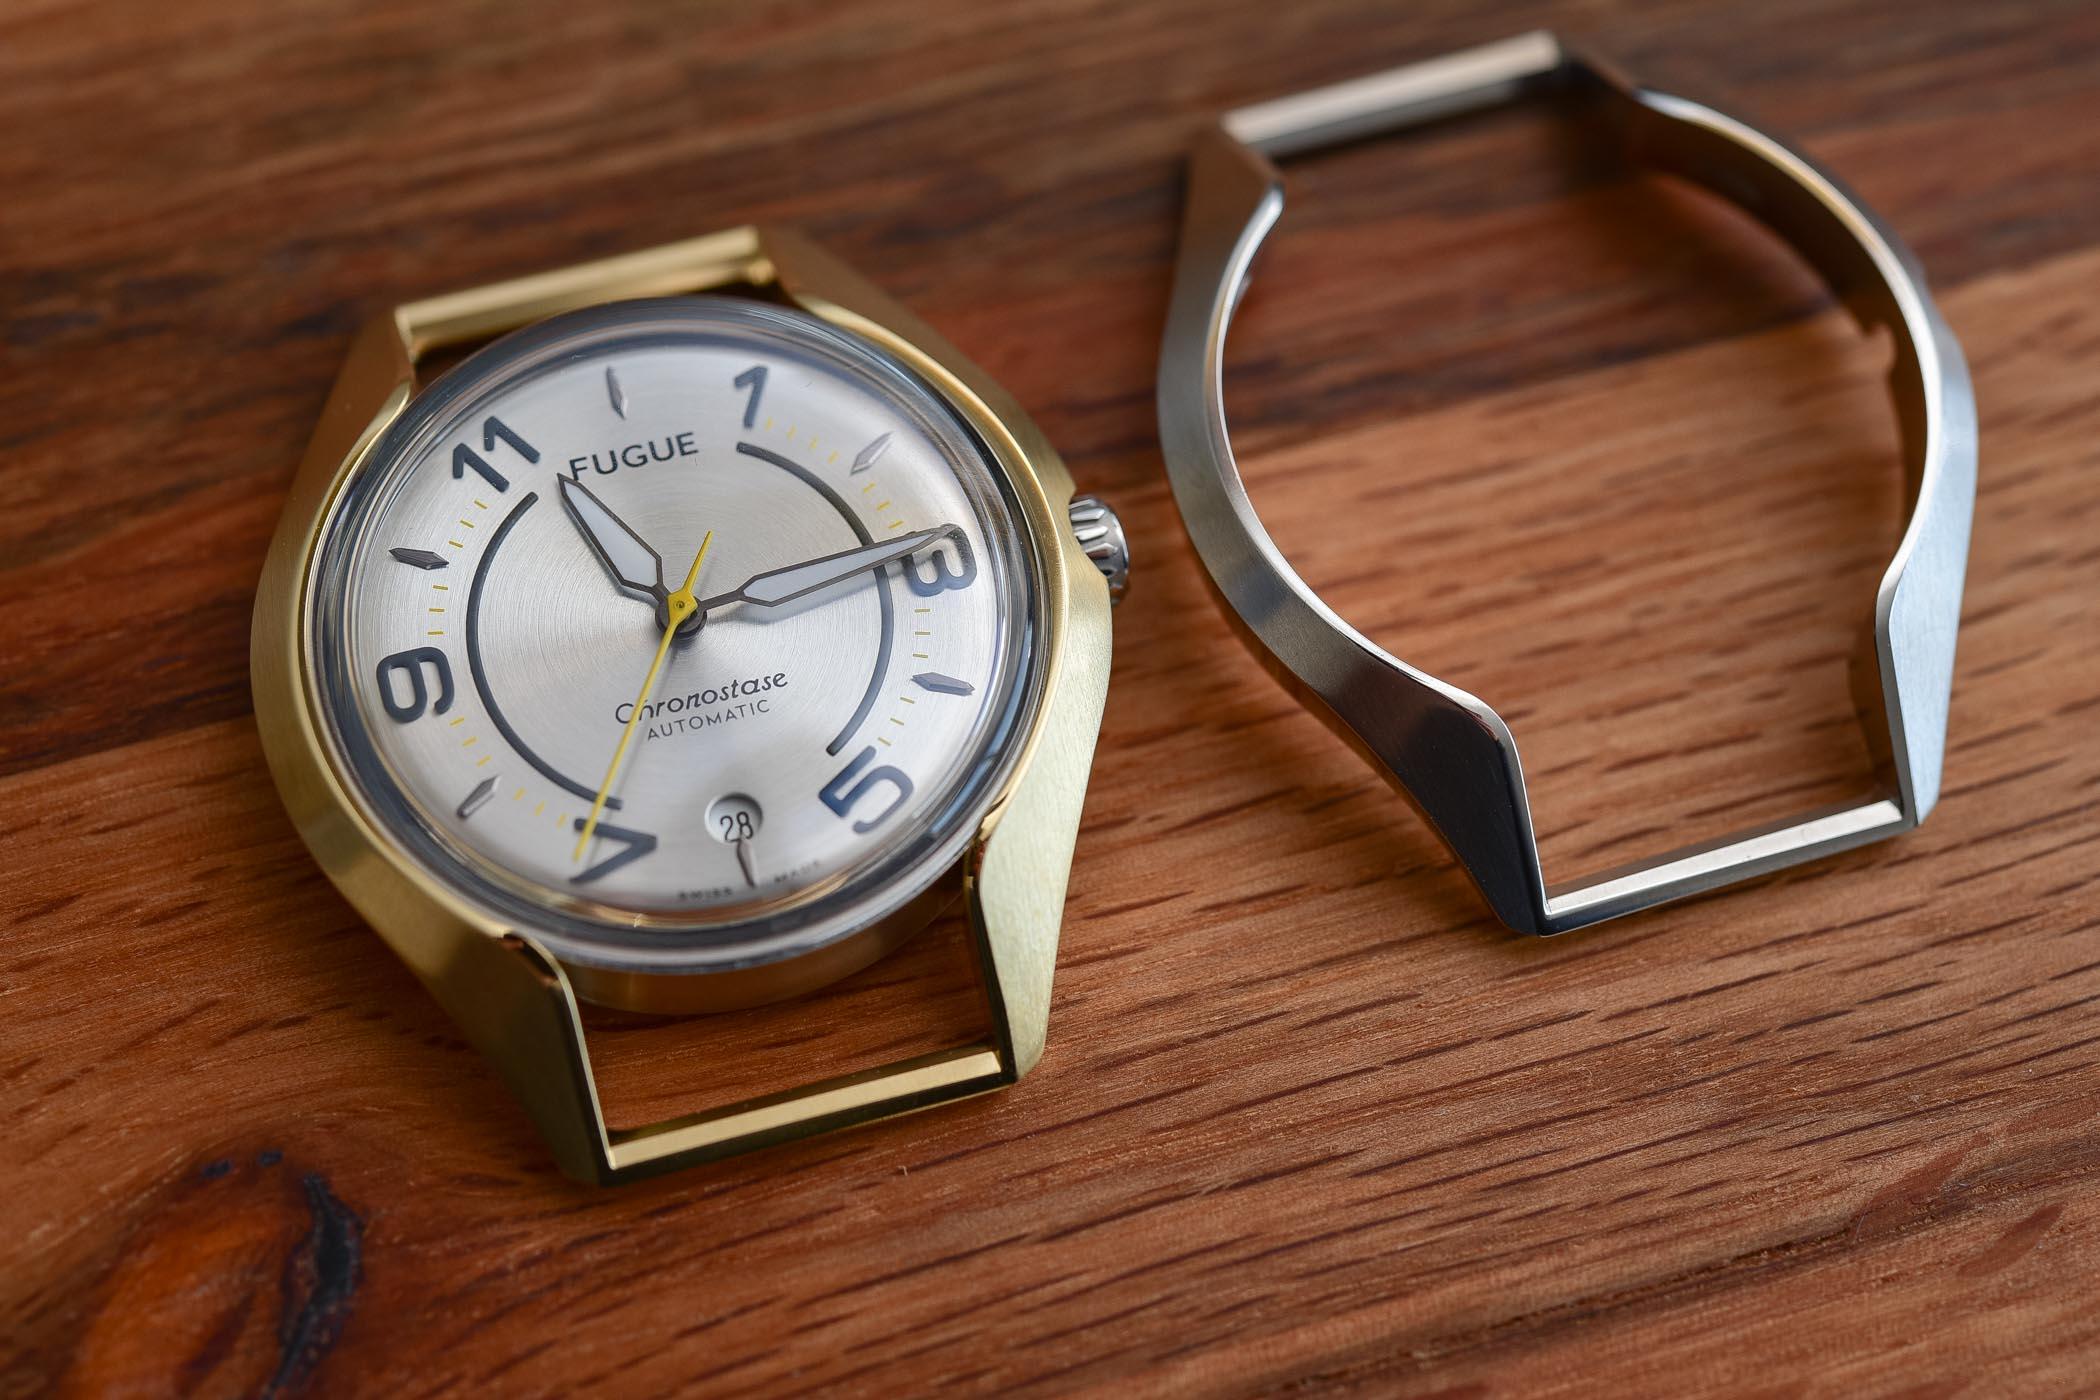 Fugue Watch Chronostase modular watch interchangeable case and strap - 10